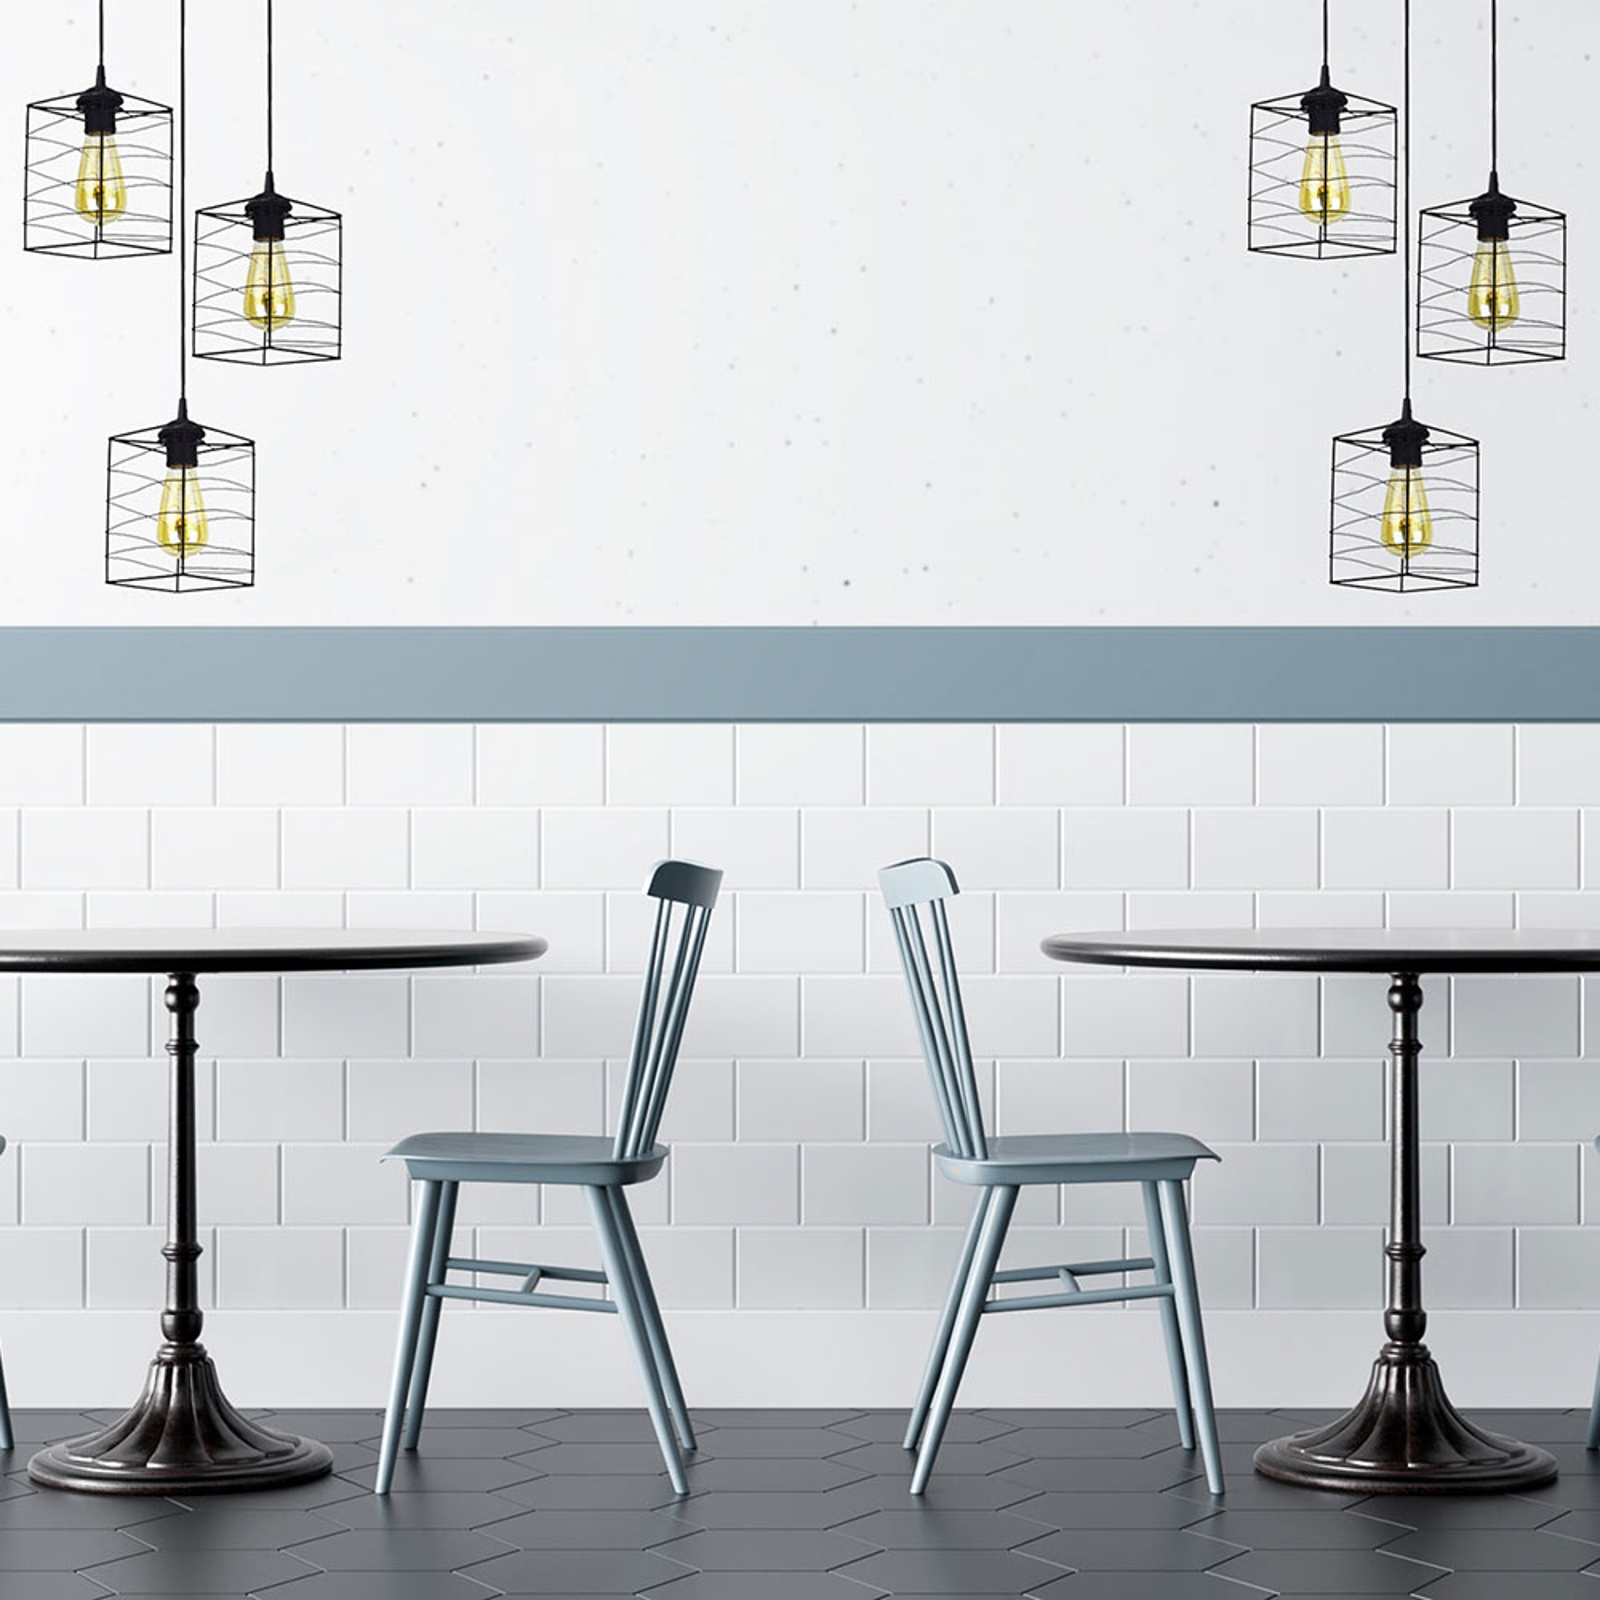 Hanglamp Dantos, 3-lamps, zwart